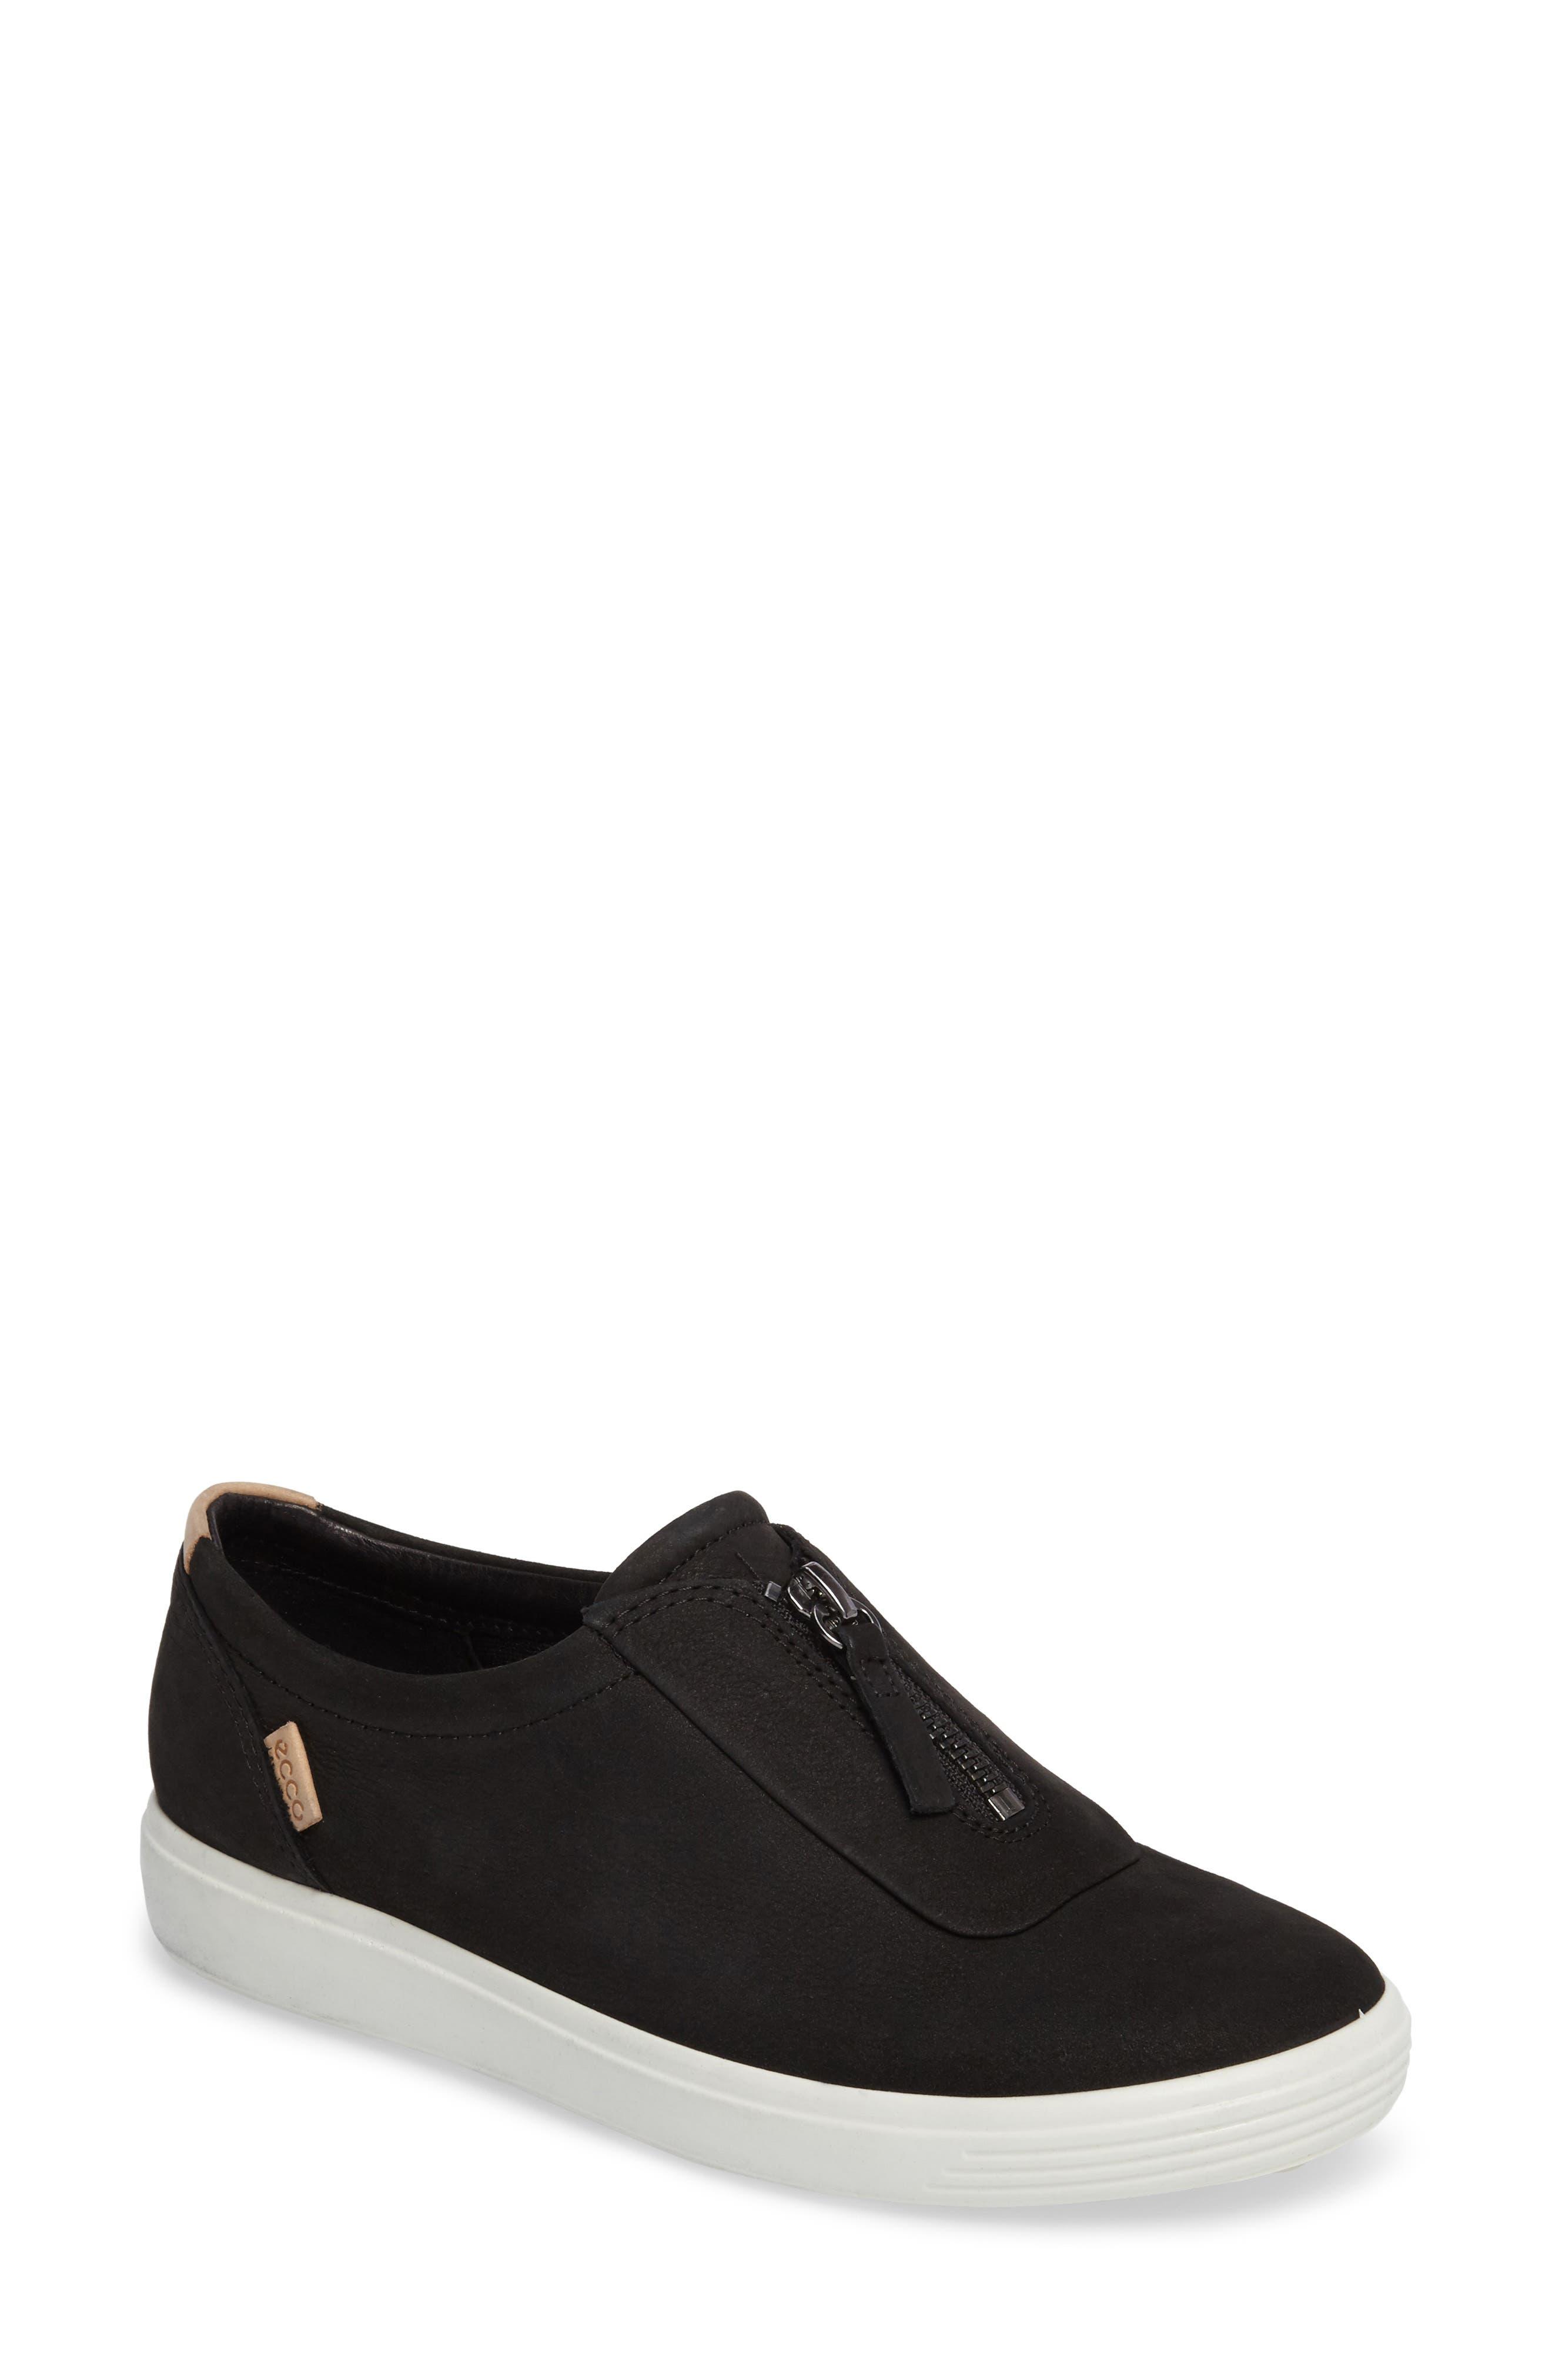 Main Image - ECCO Soft 7 Slip-On Sneaker (Women)